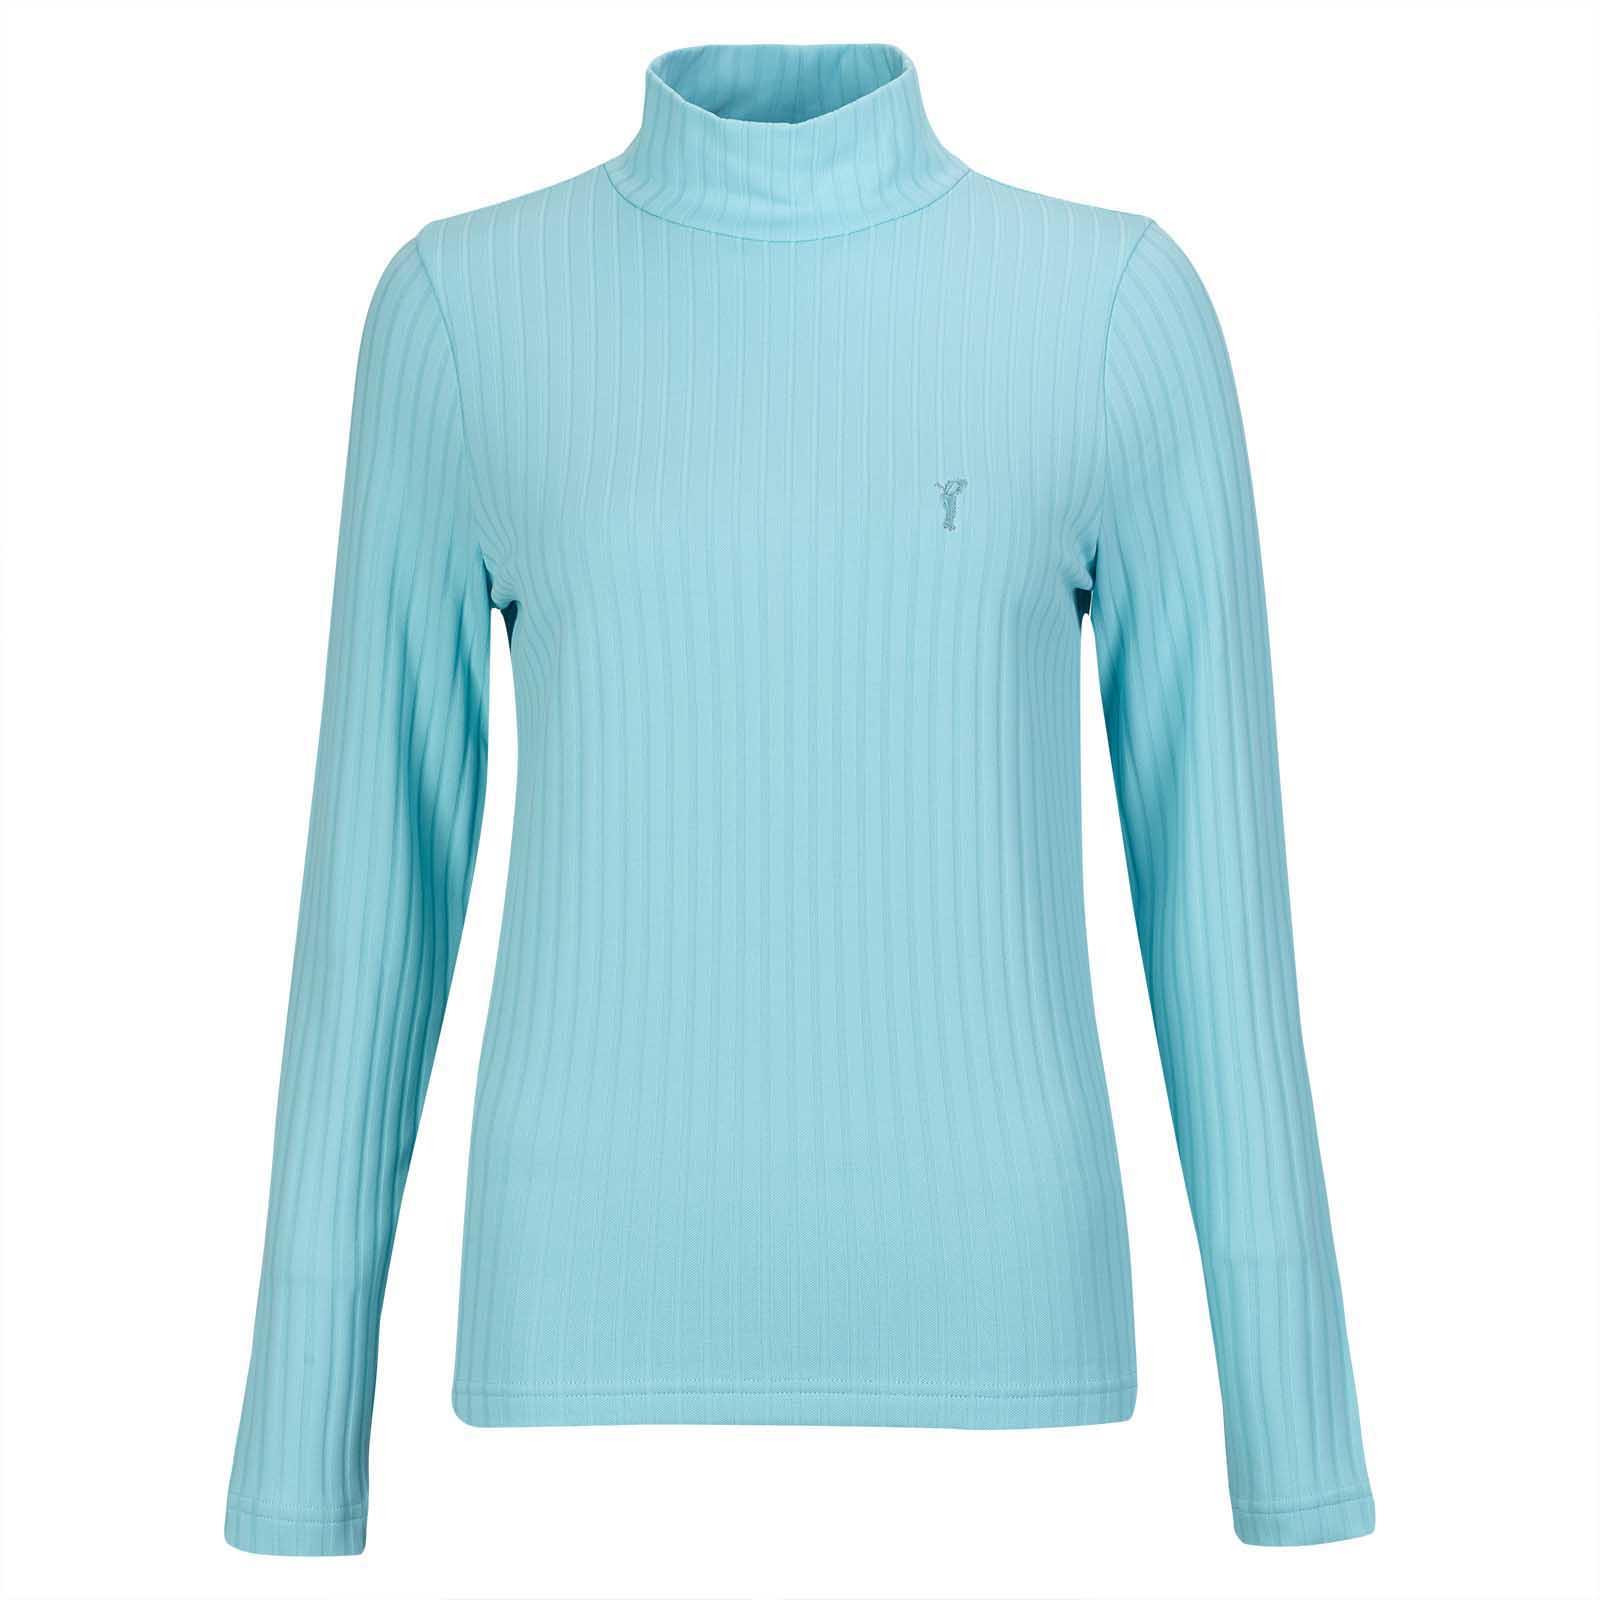 Ladies' Dry Comfort roll-neck stretch underlayer in slim fit